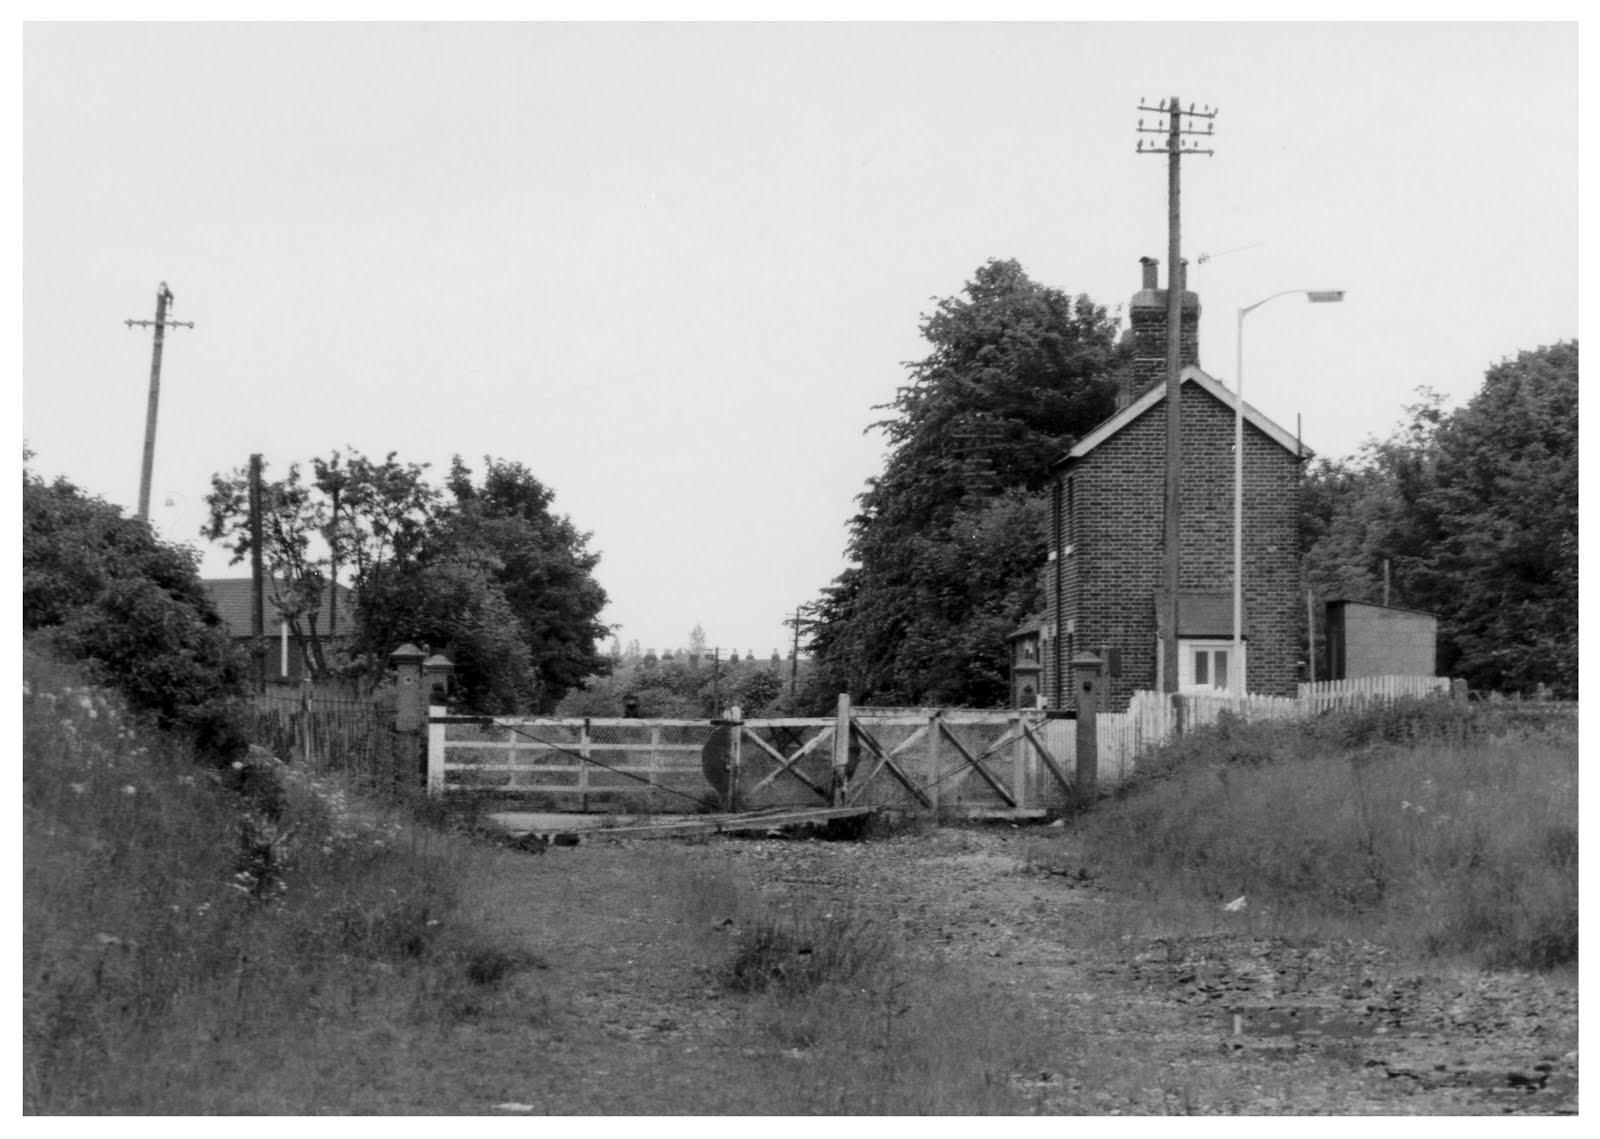 Brockhurst Crossing